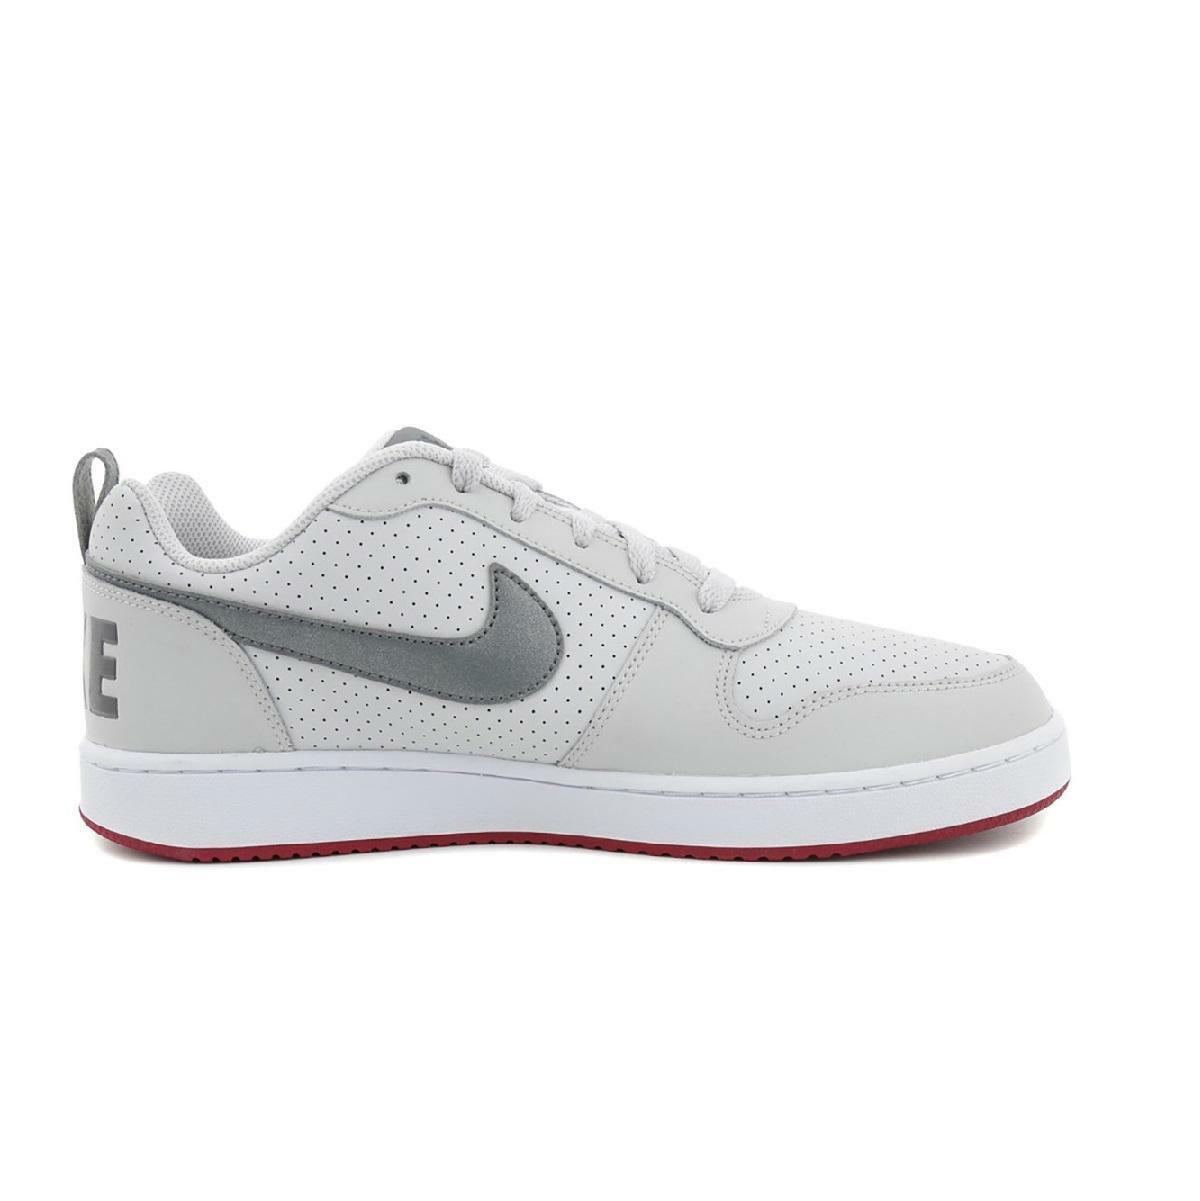 Herren Nike Hof BGoldugh Niedrig Große Graue Sportschuhe 838937 004